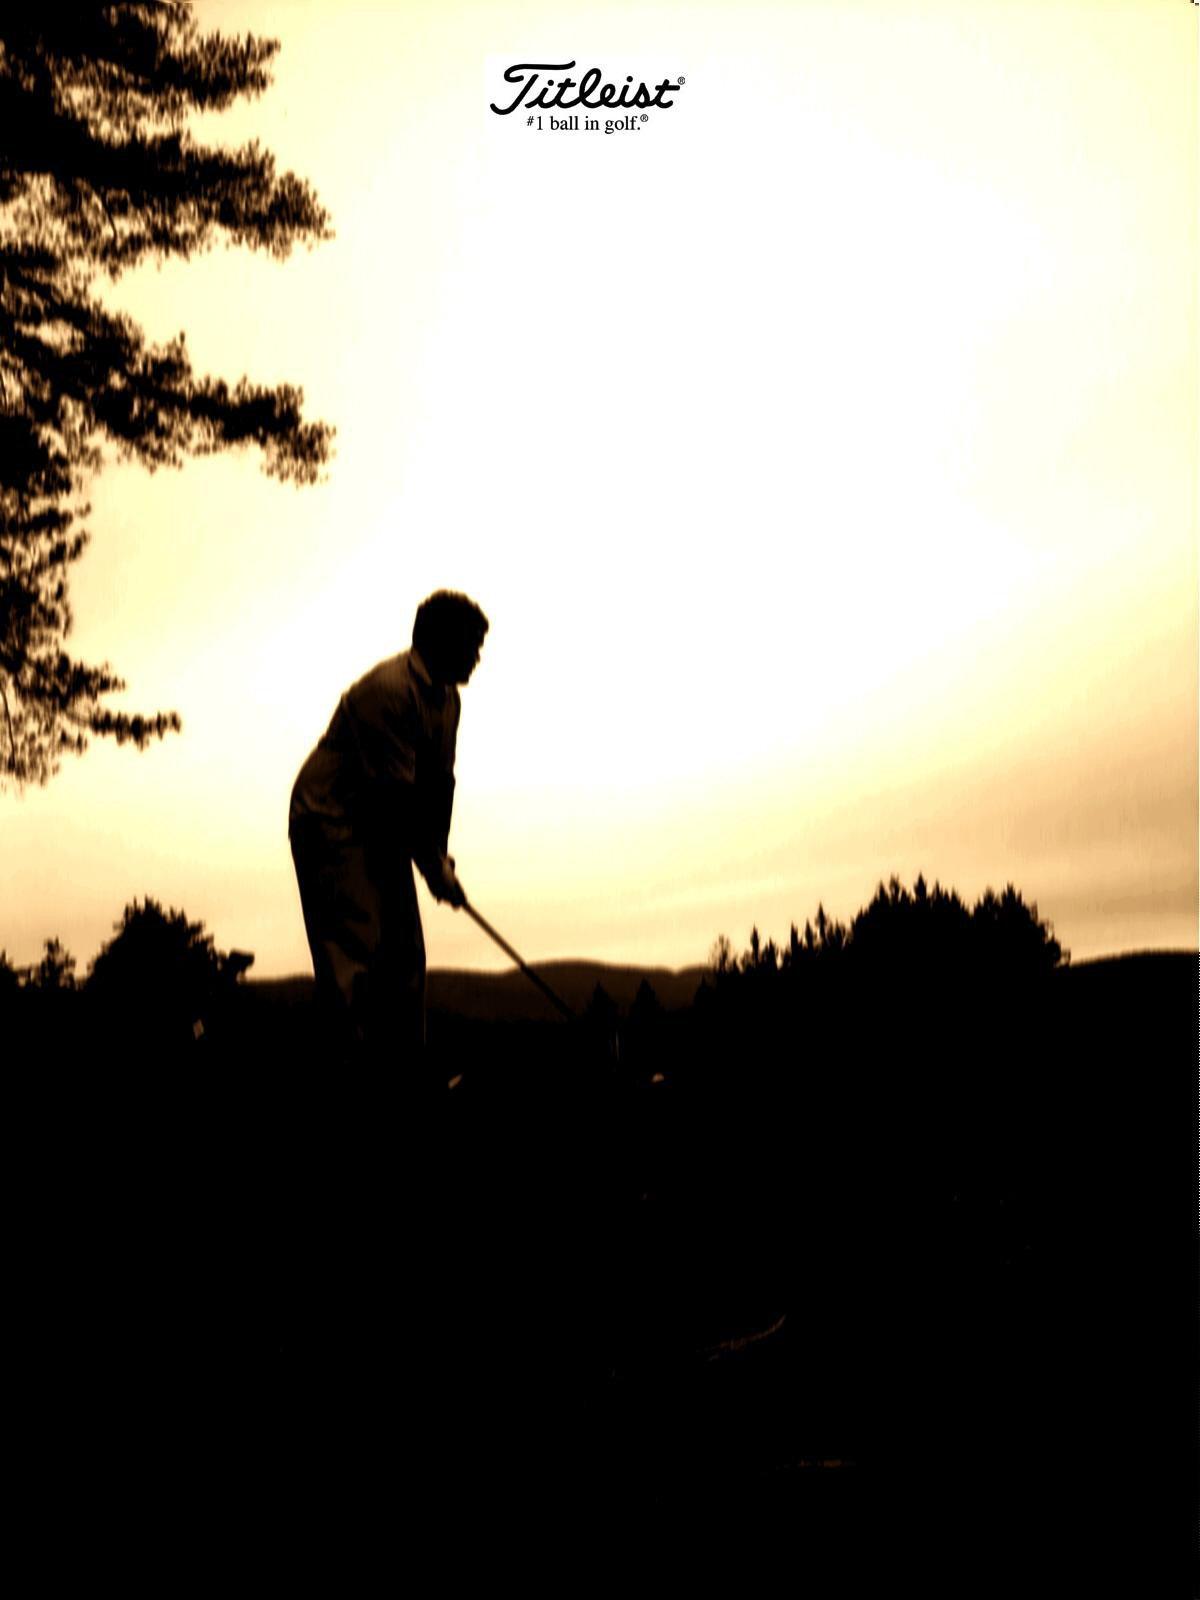 Golfing Taconic